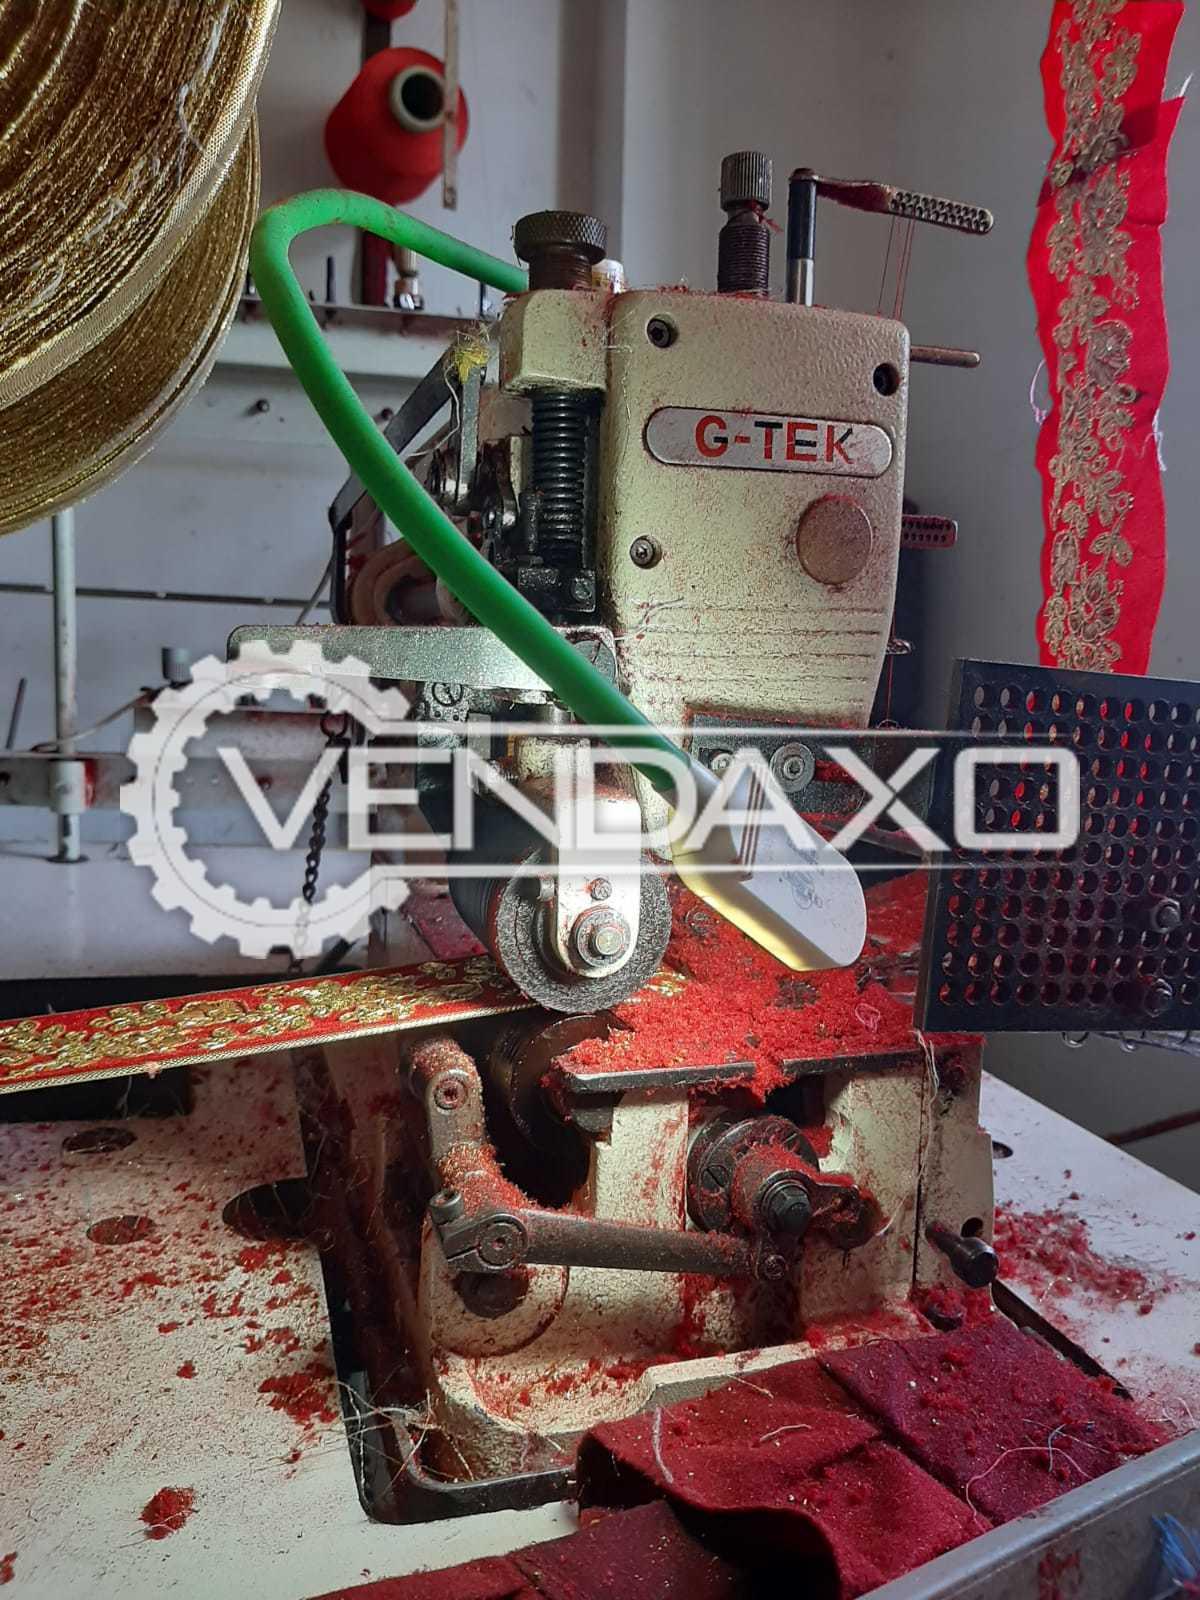 G-TEK Sewing Machine - 23 Needle